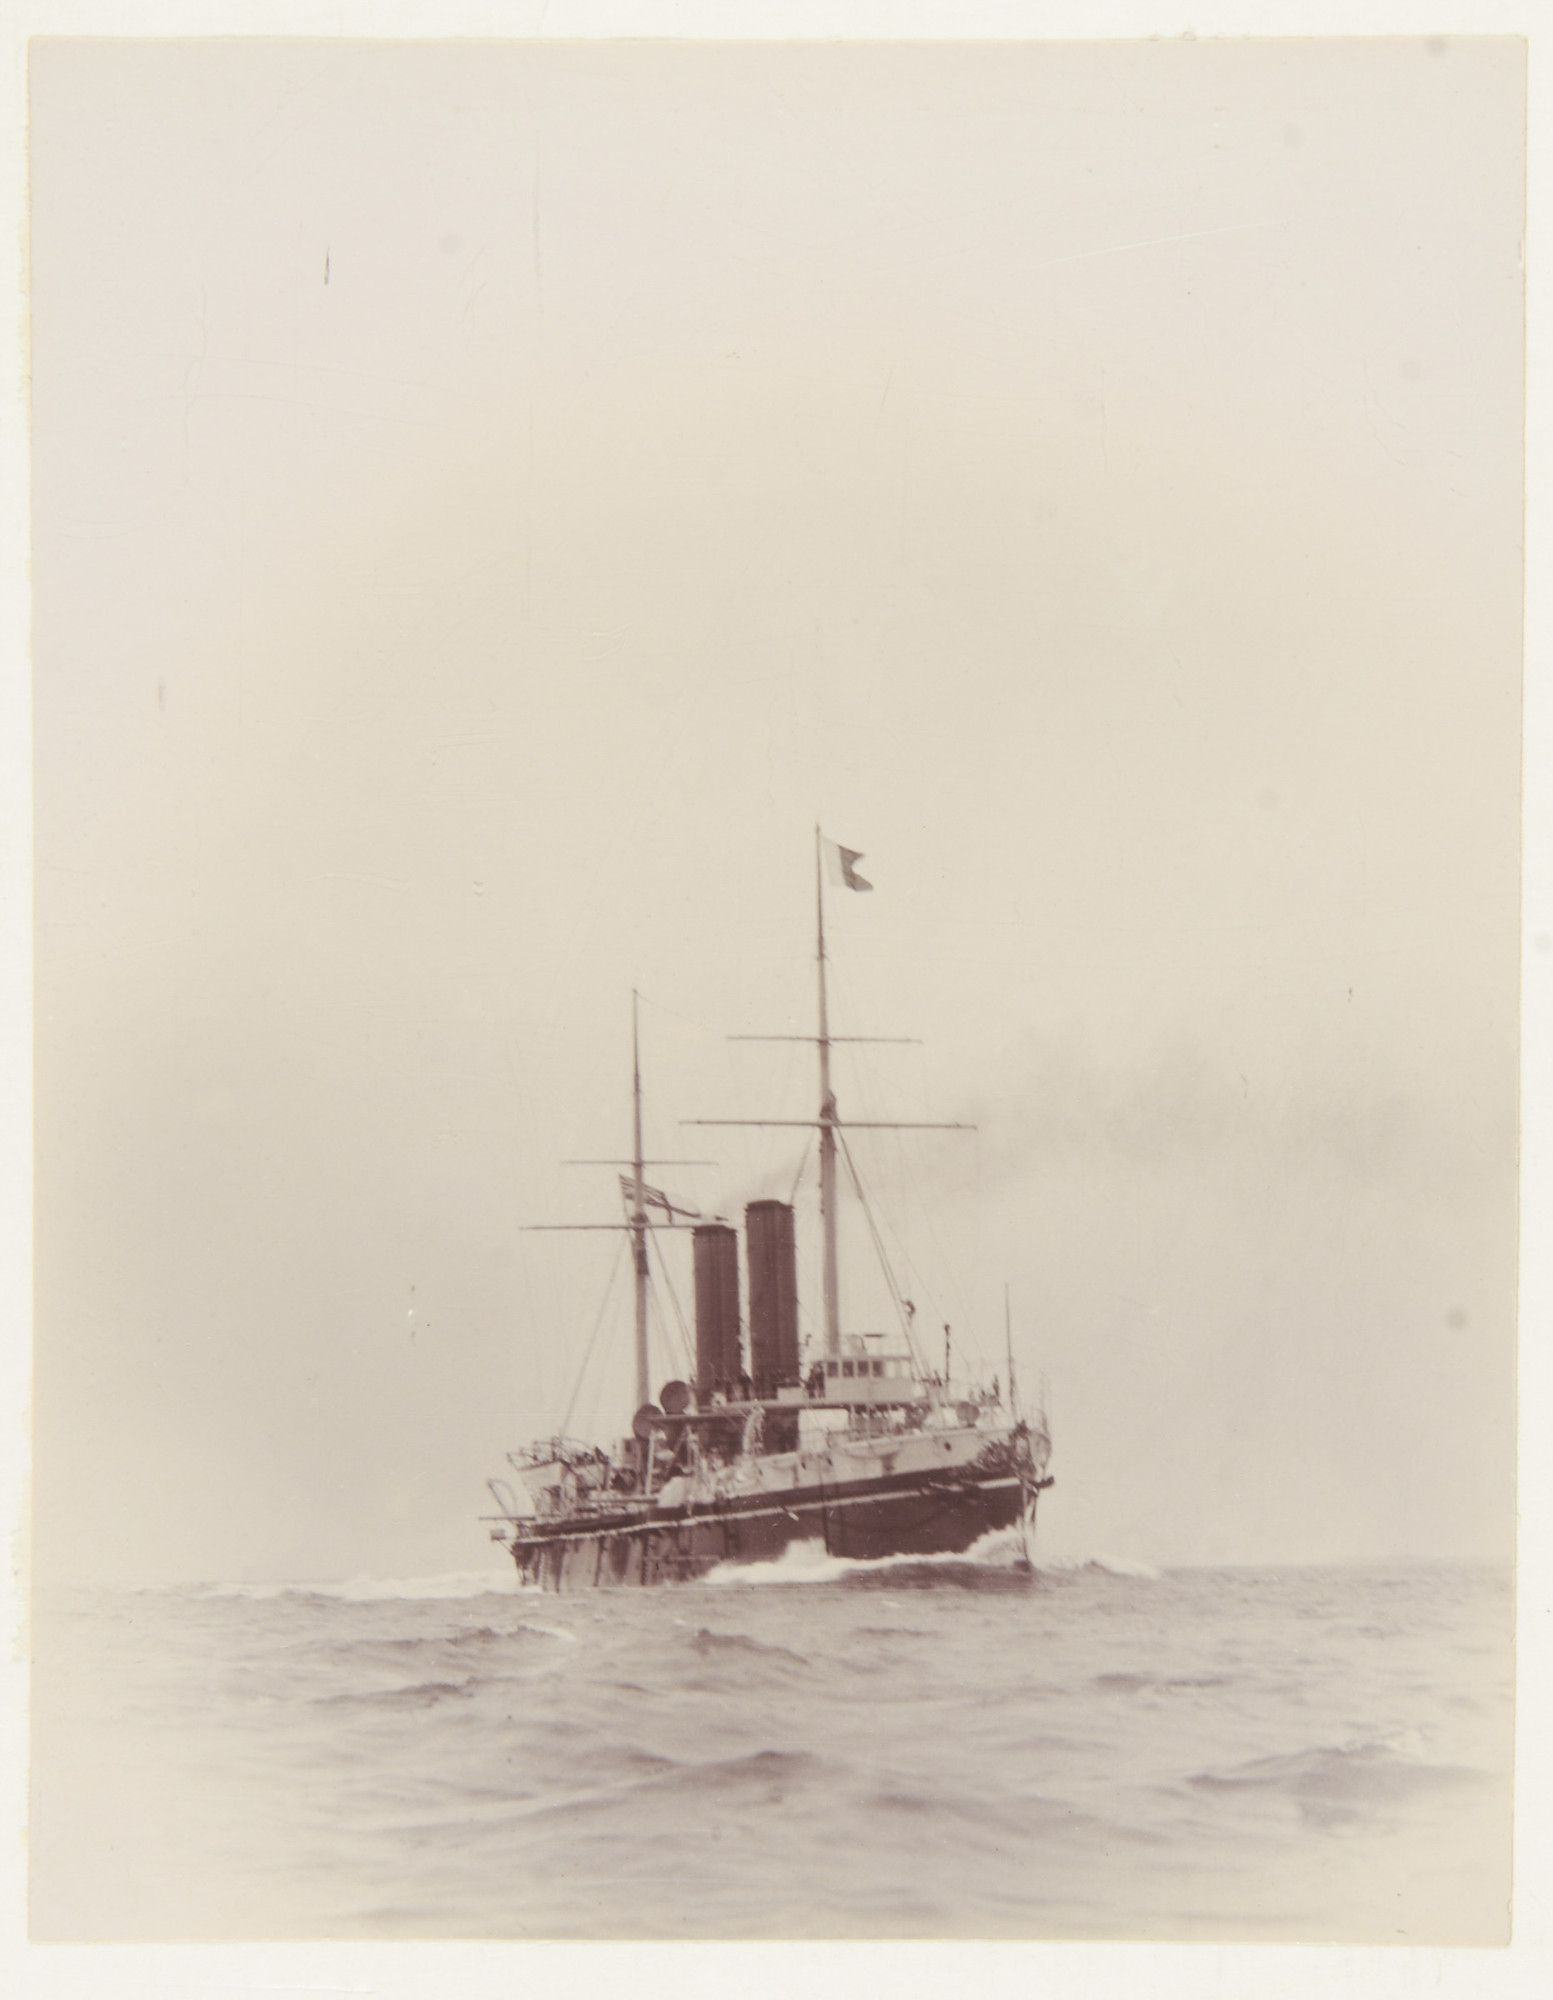 Жизнь крейсера на рубеже 20-го века